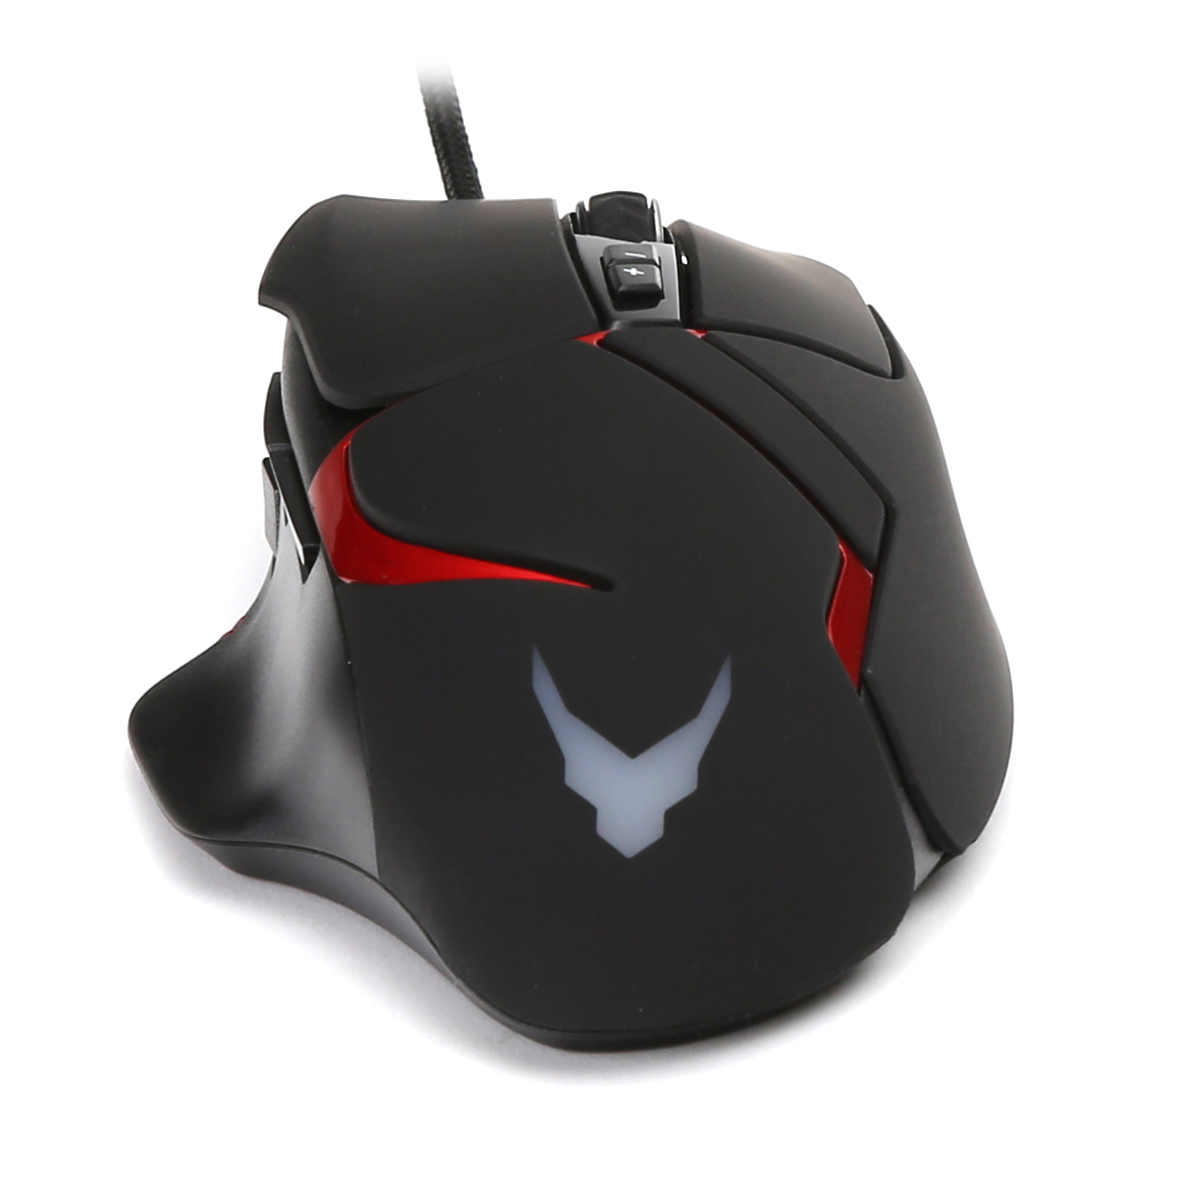 Varr VGM0360 Gaming mouse, rechtshandig, 1,7m braided USB kabel, 1200-1600-2000-3200 dpi instelbaar, 138gram